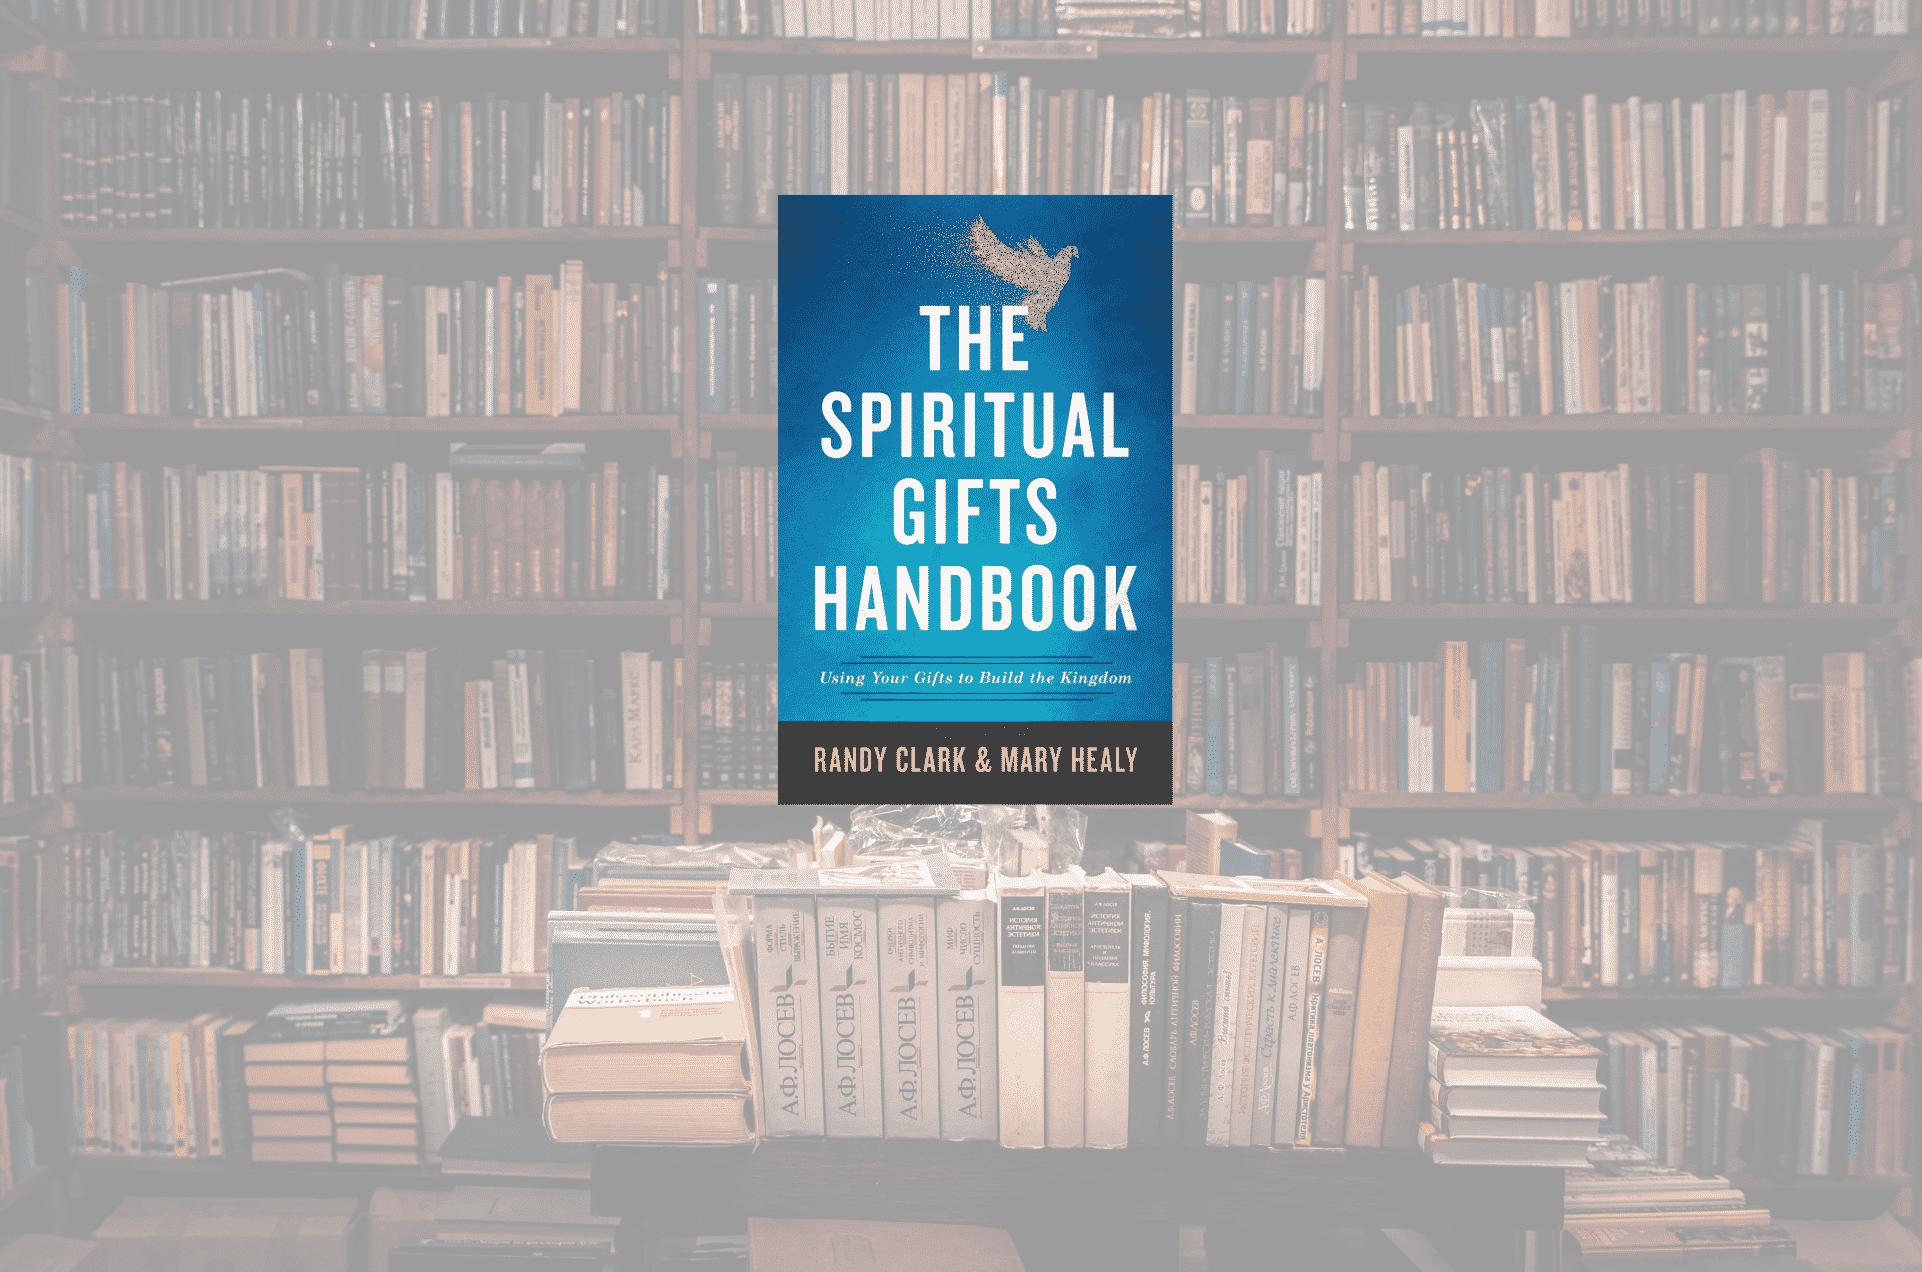 THE SPIRITUAL GIFTS OF HANDBOOK